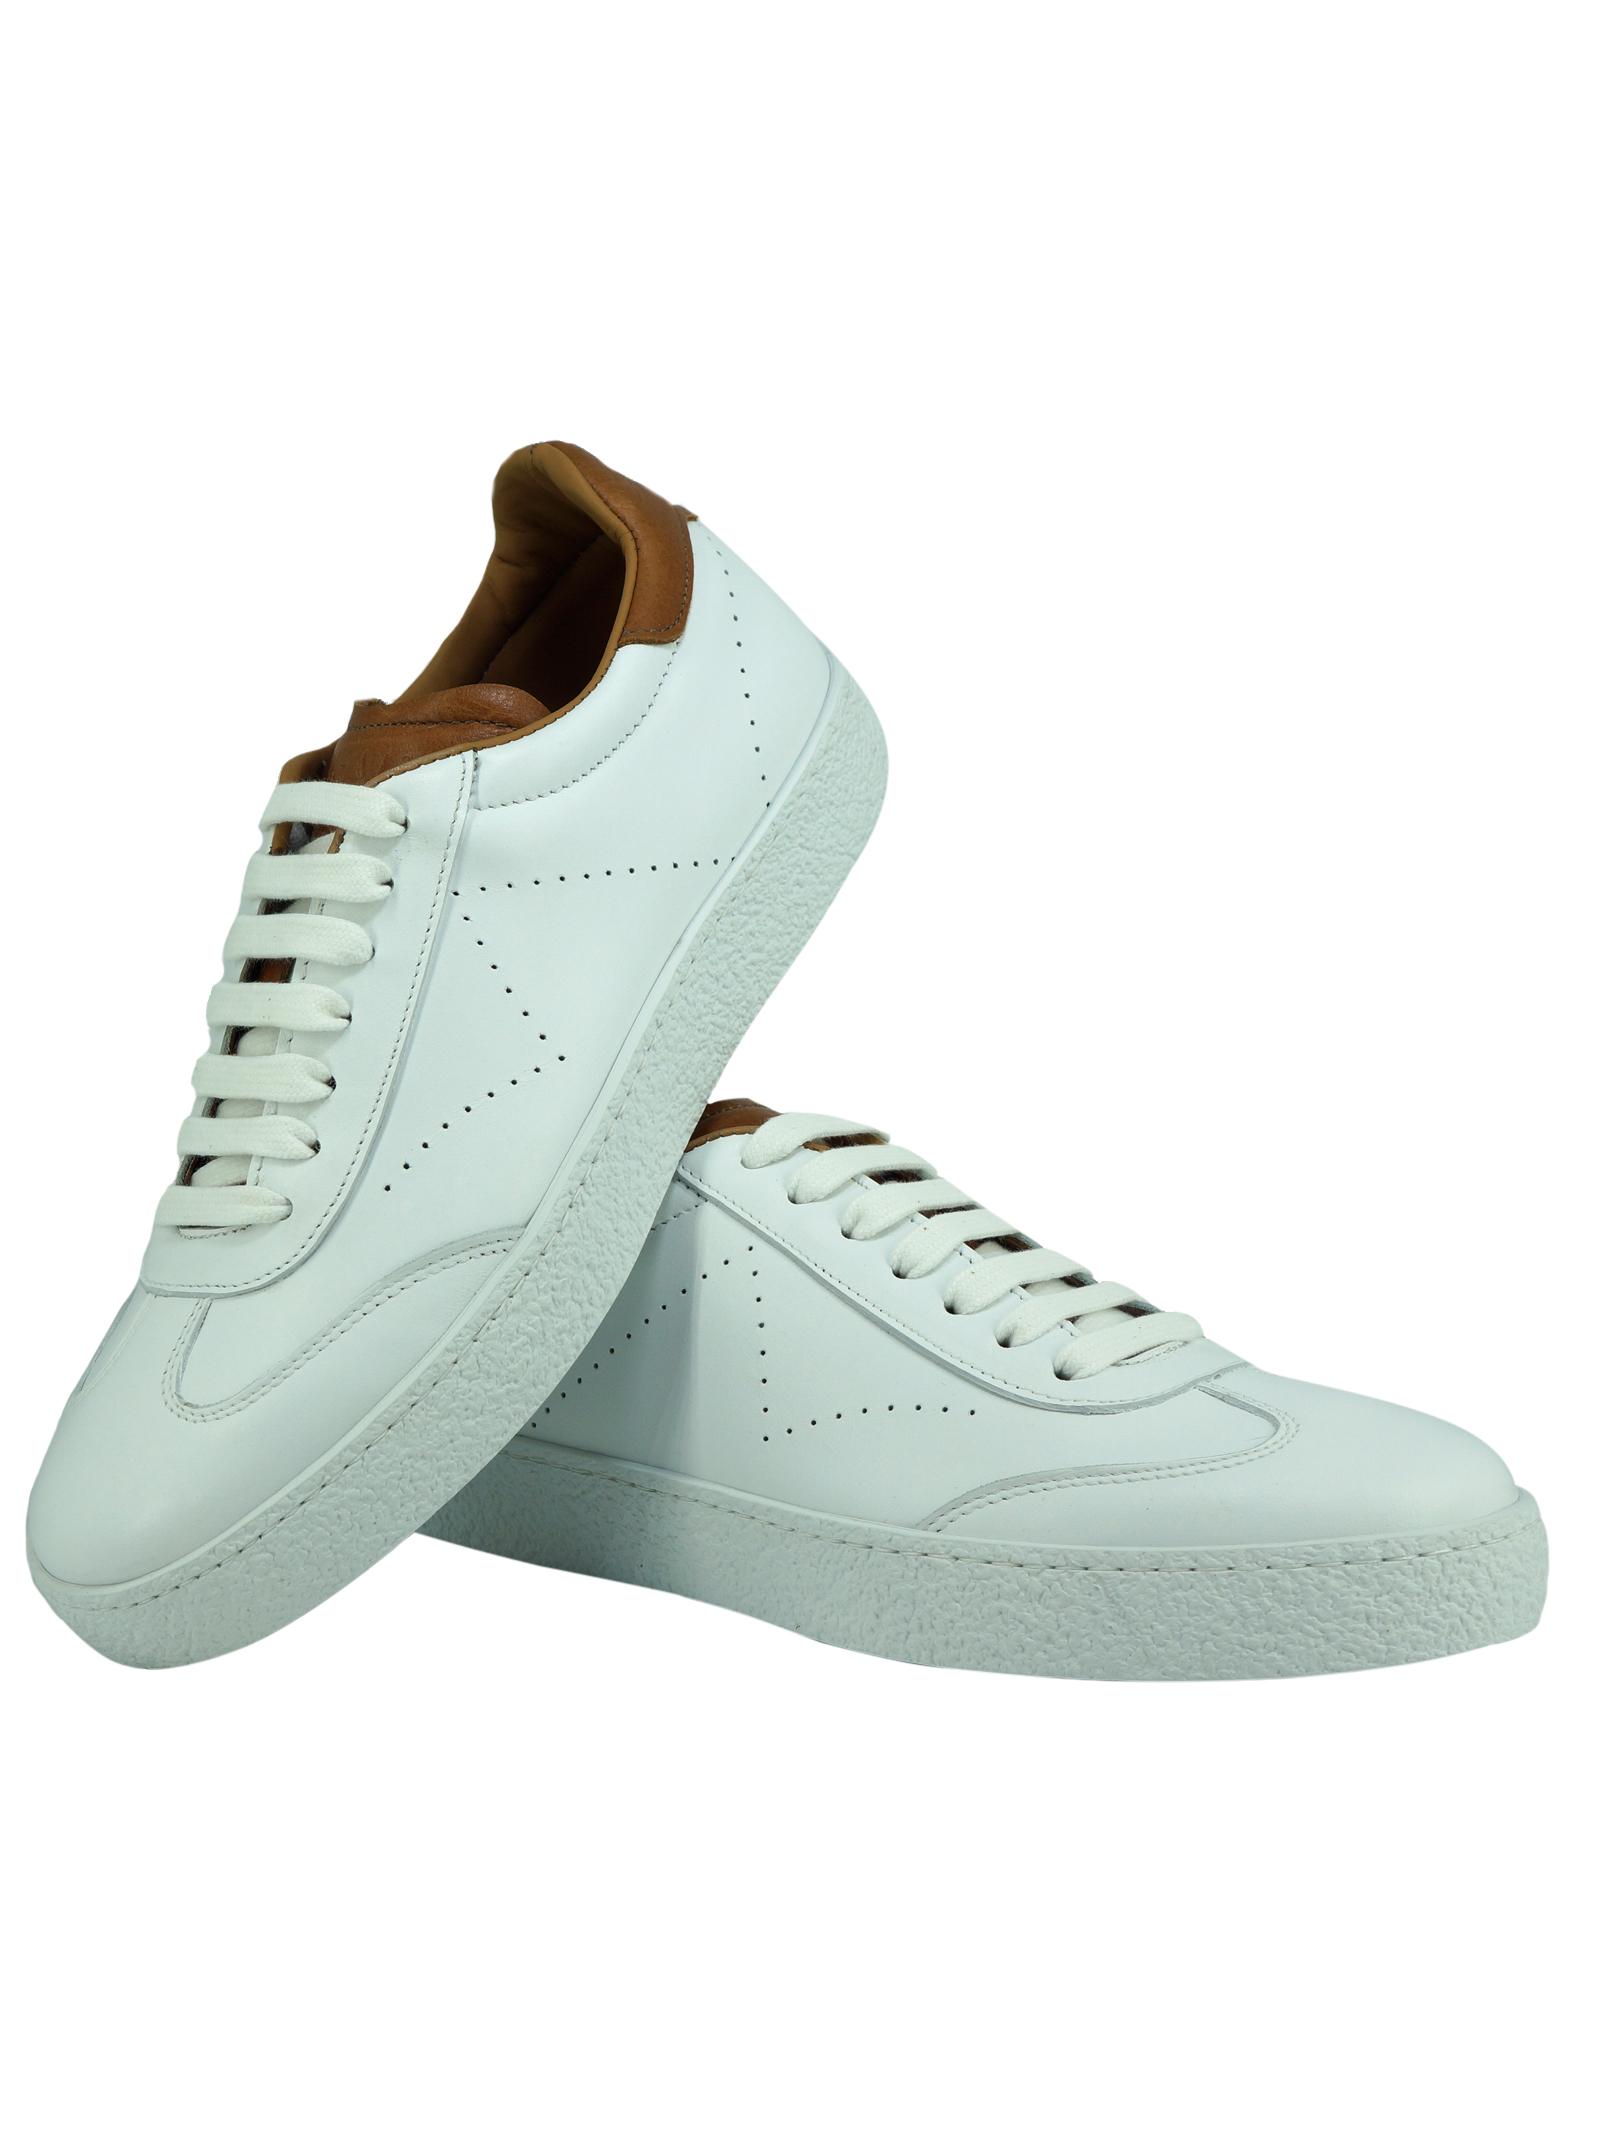 Sneakers Uomo in Pelle Rogal's Rogal's | Sneakers | PAND3MIBIANCO